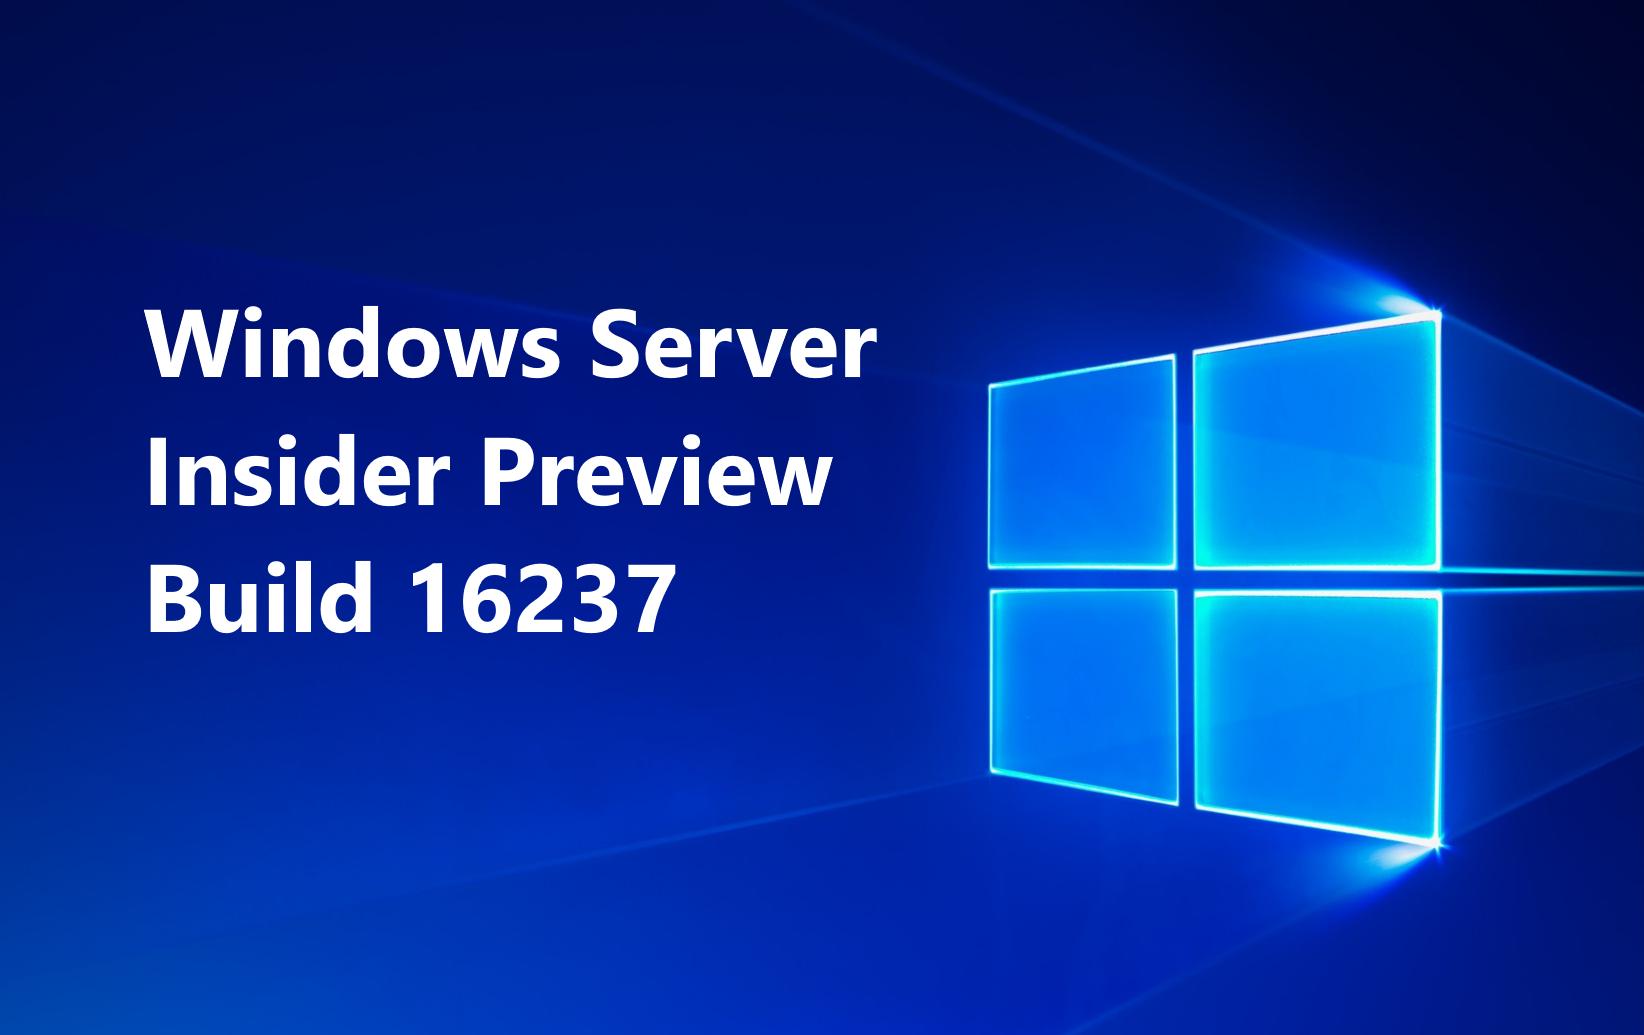 Windows Server Insider Preview Build Release Tracker (2017